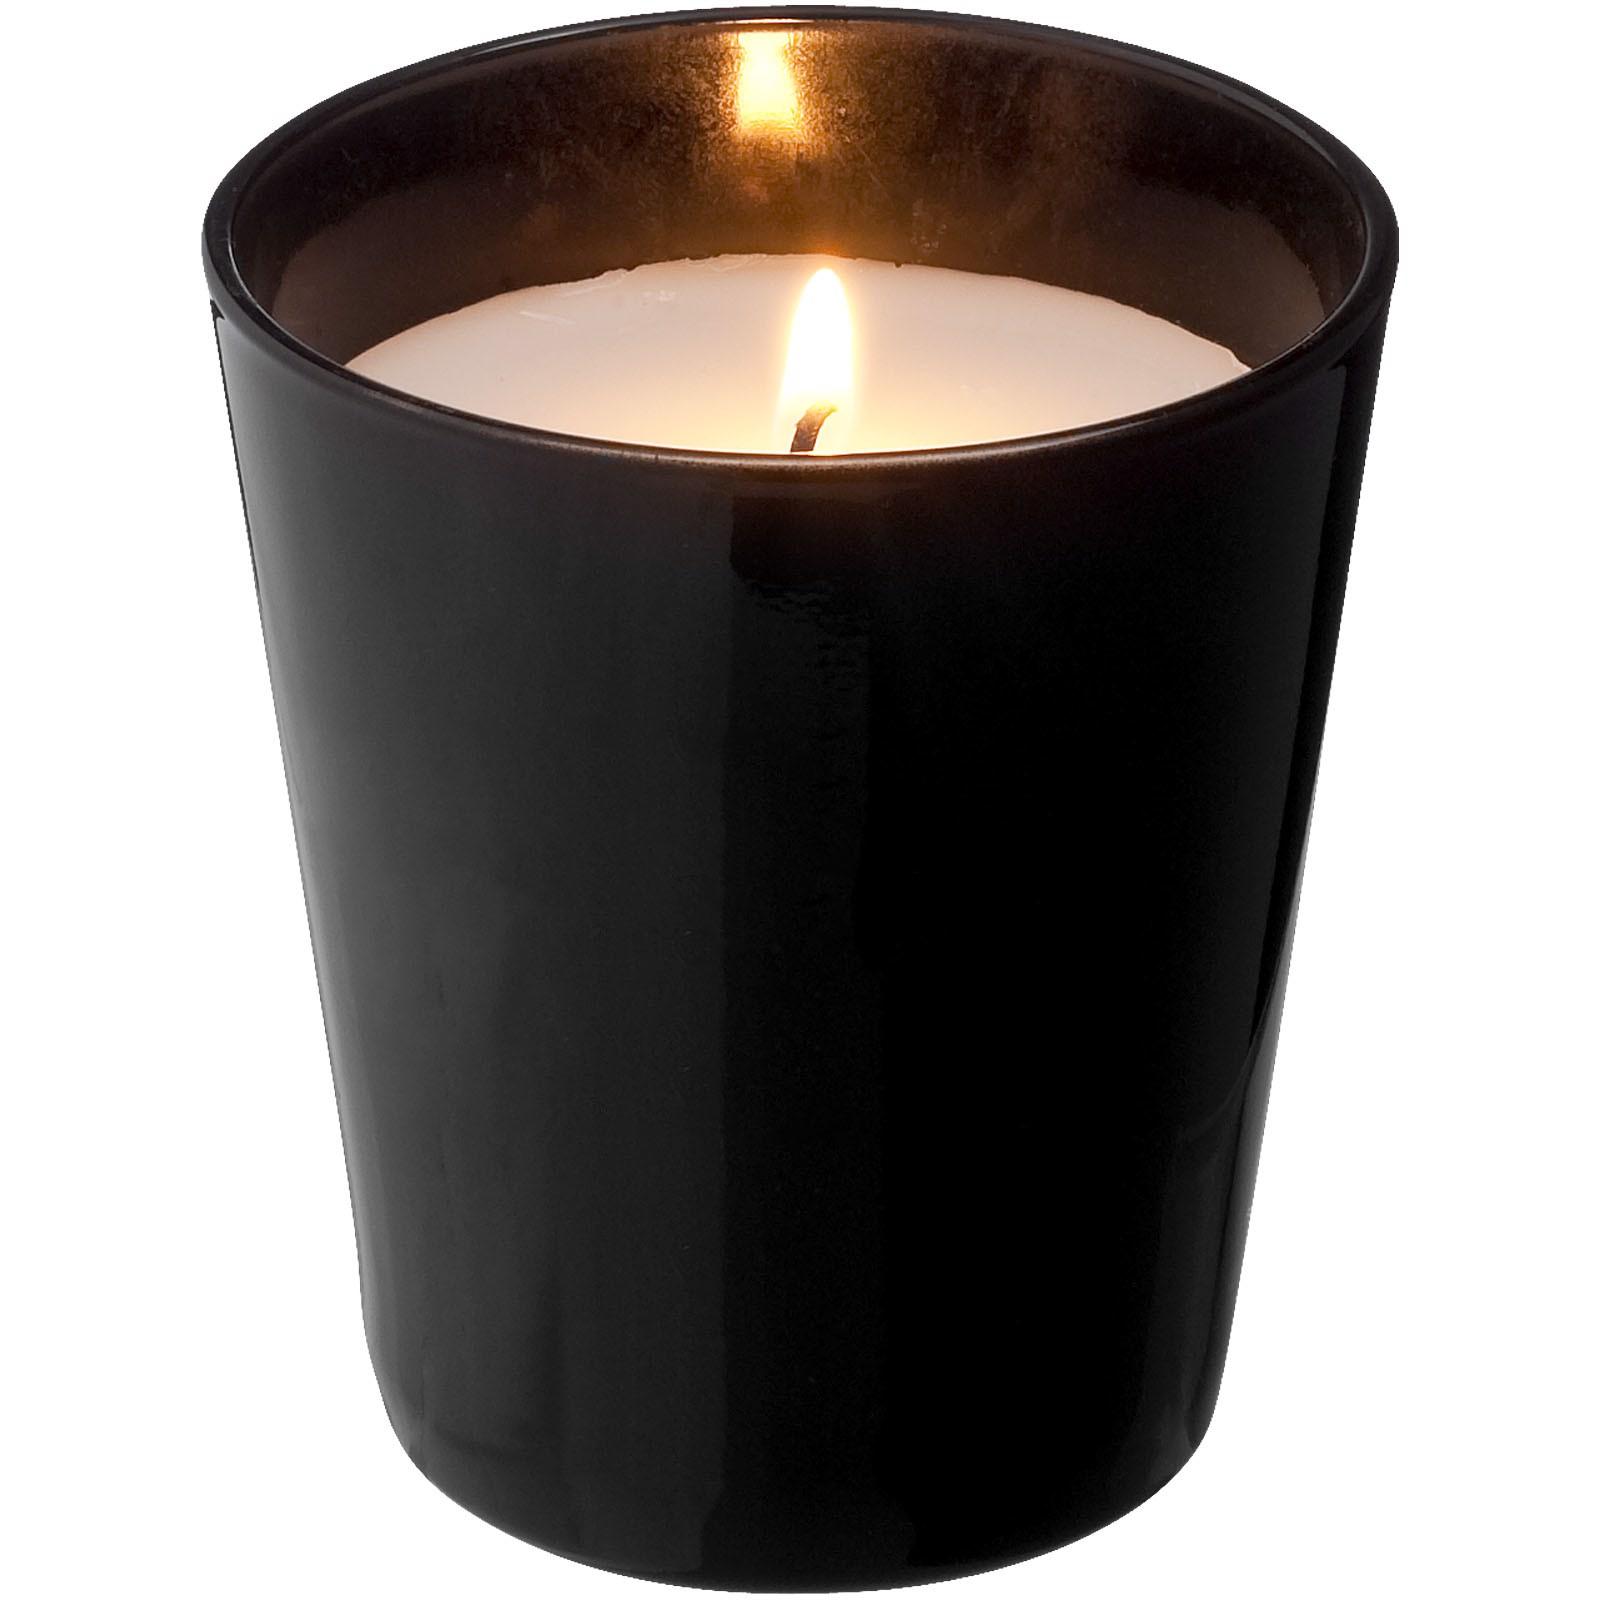 Lunar scented candle - Solid black